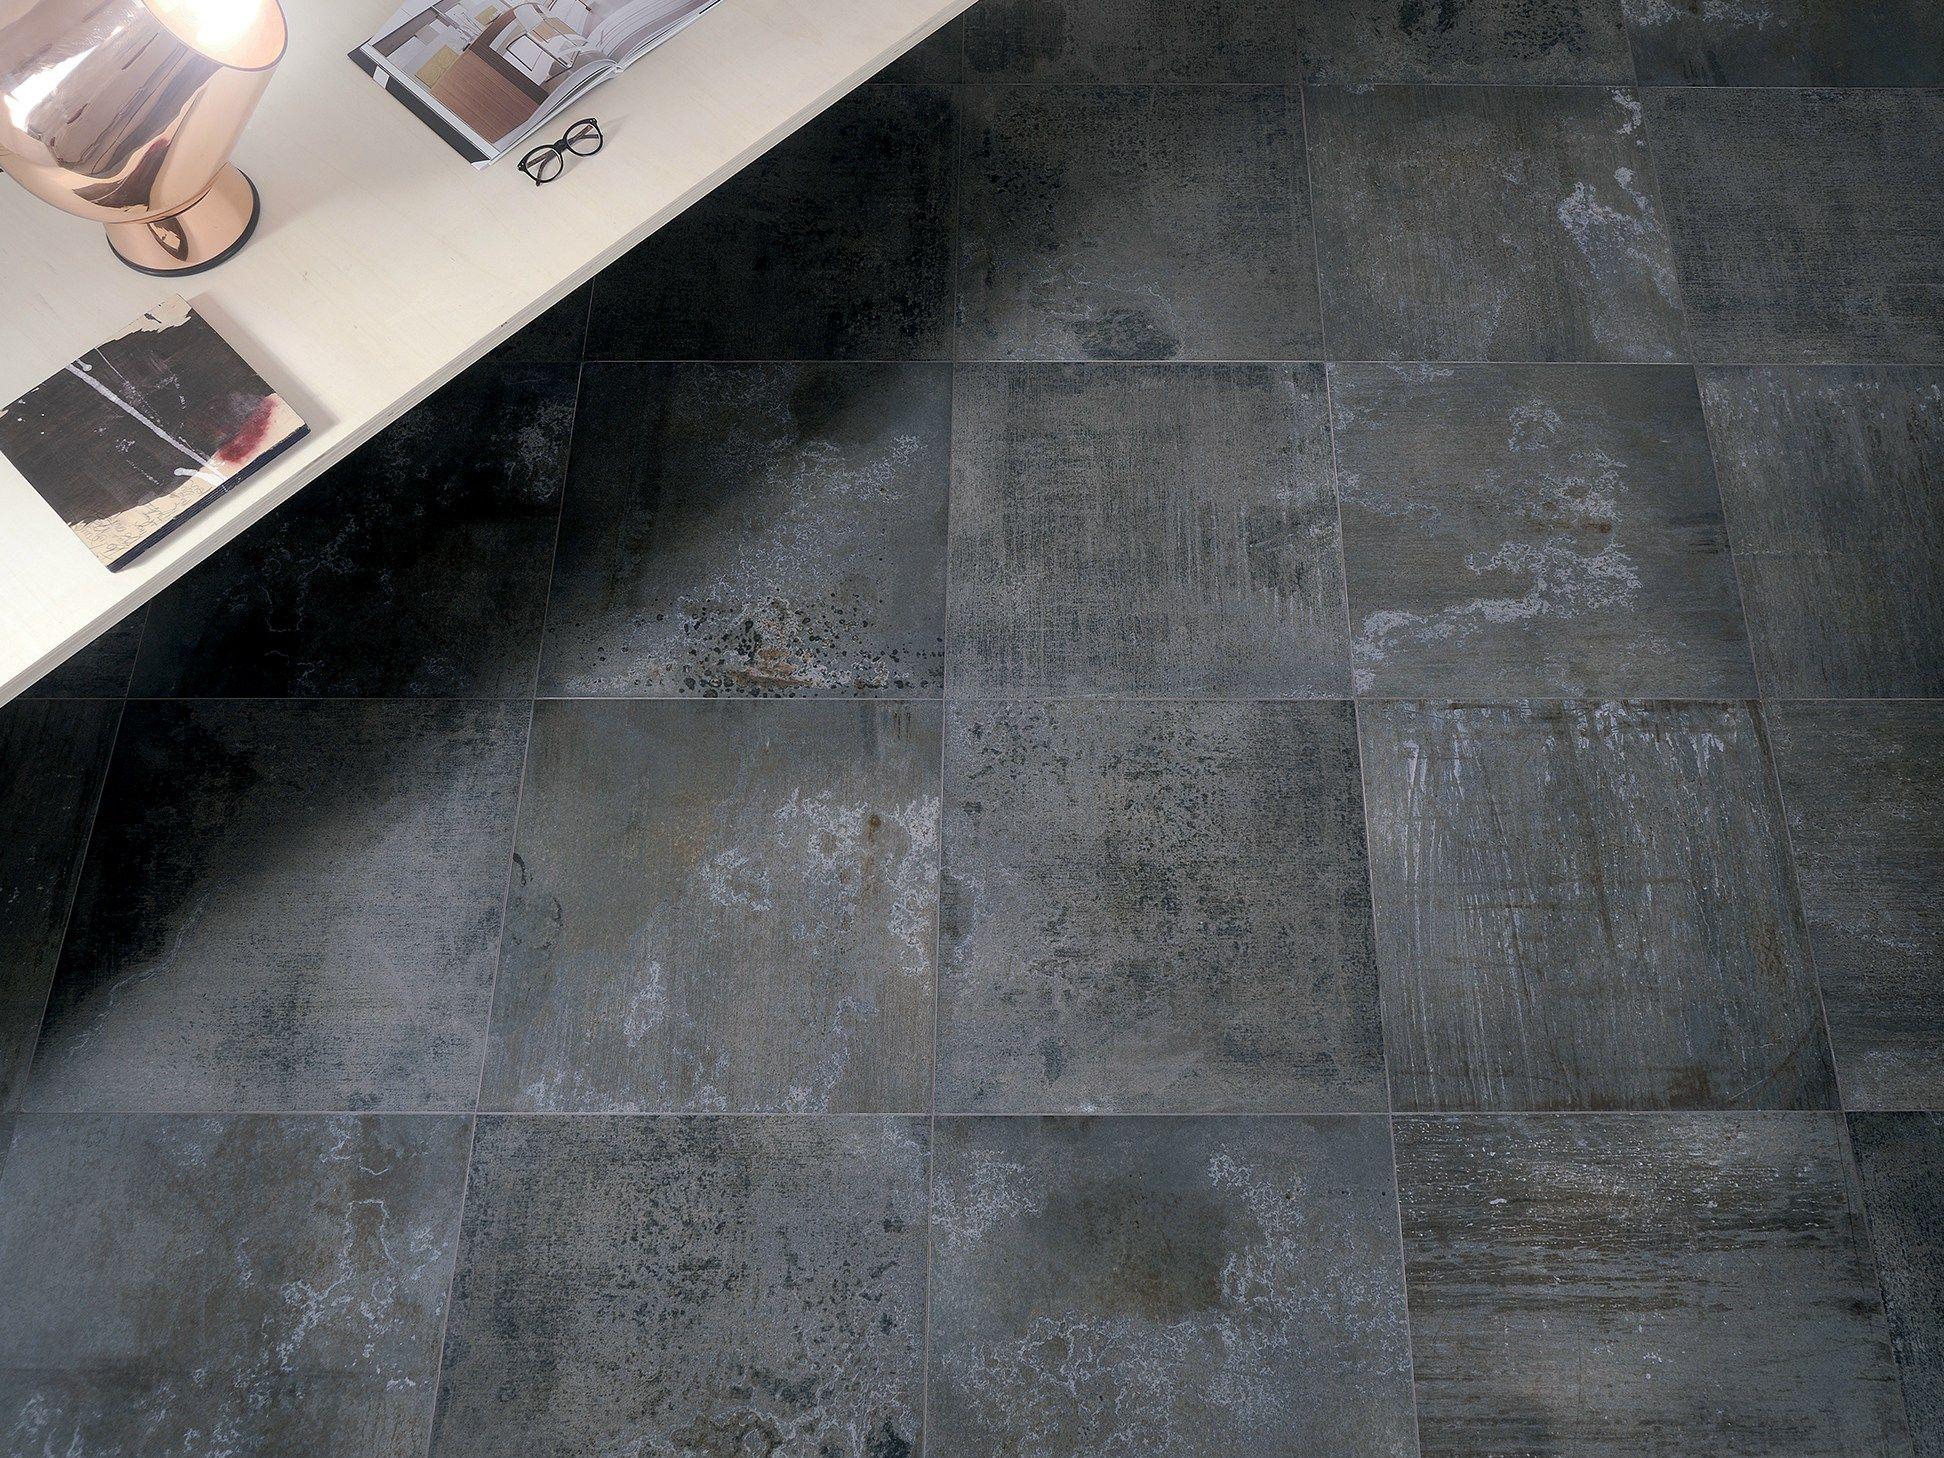 Porcelain stoneware flooring metalbax by ceramica fioranese porcelain stoneware flooring metalbax by ceramica fioranese ceramic floor tileswall dailygadgetfo Images